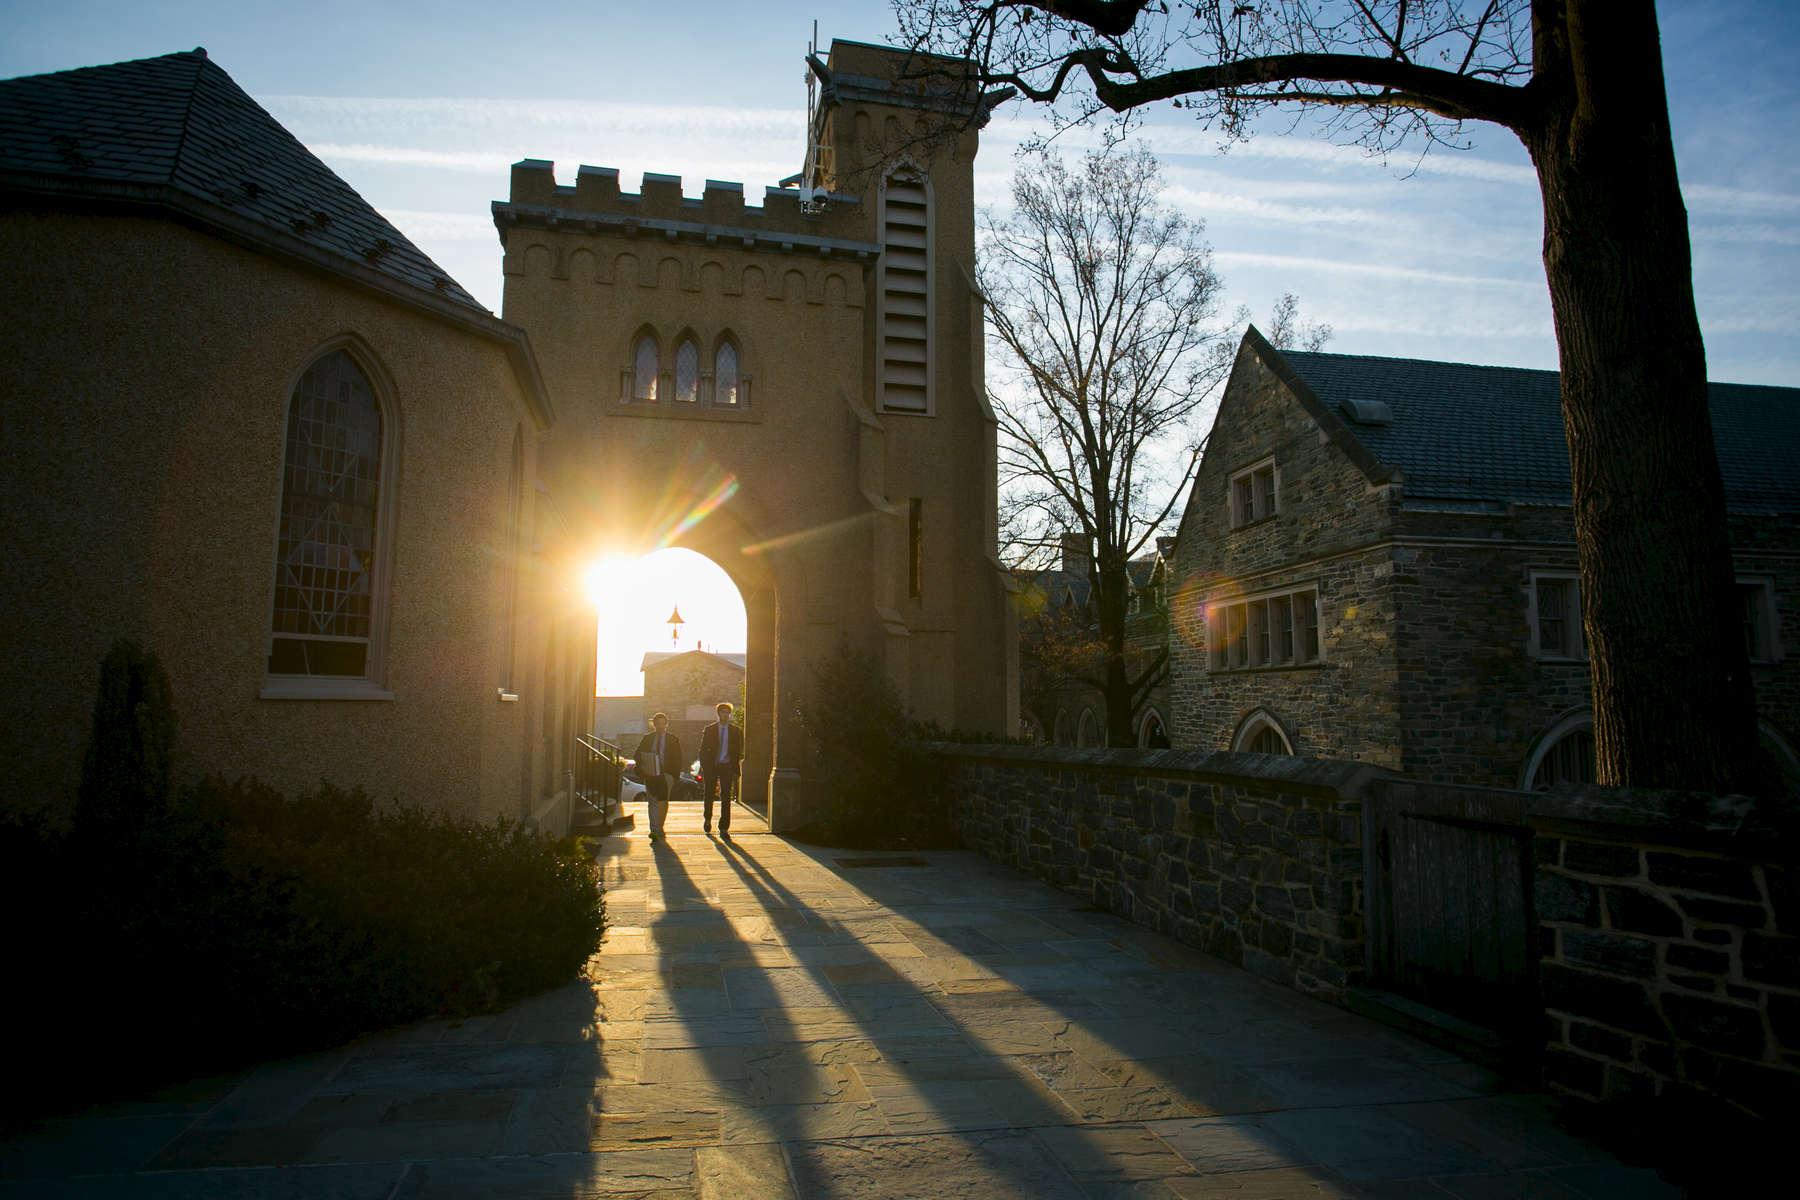 St. Albans School on December 4, 2014.